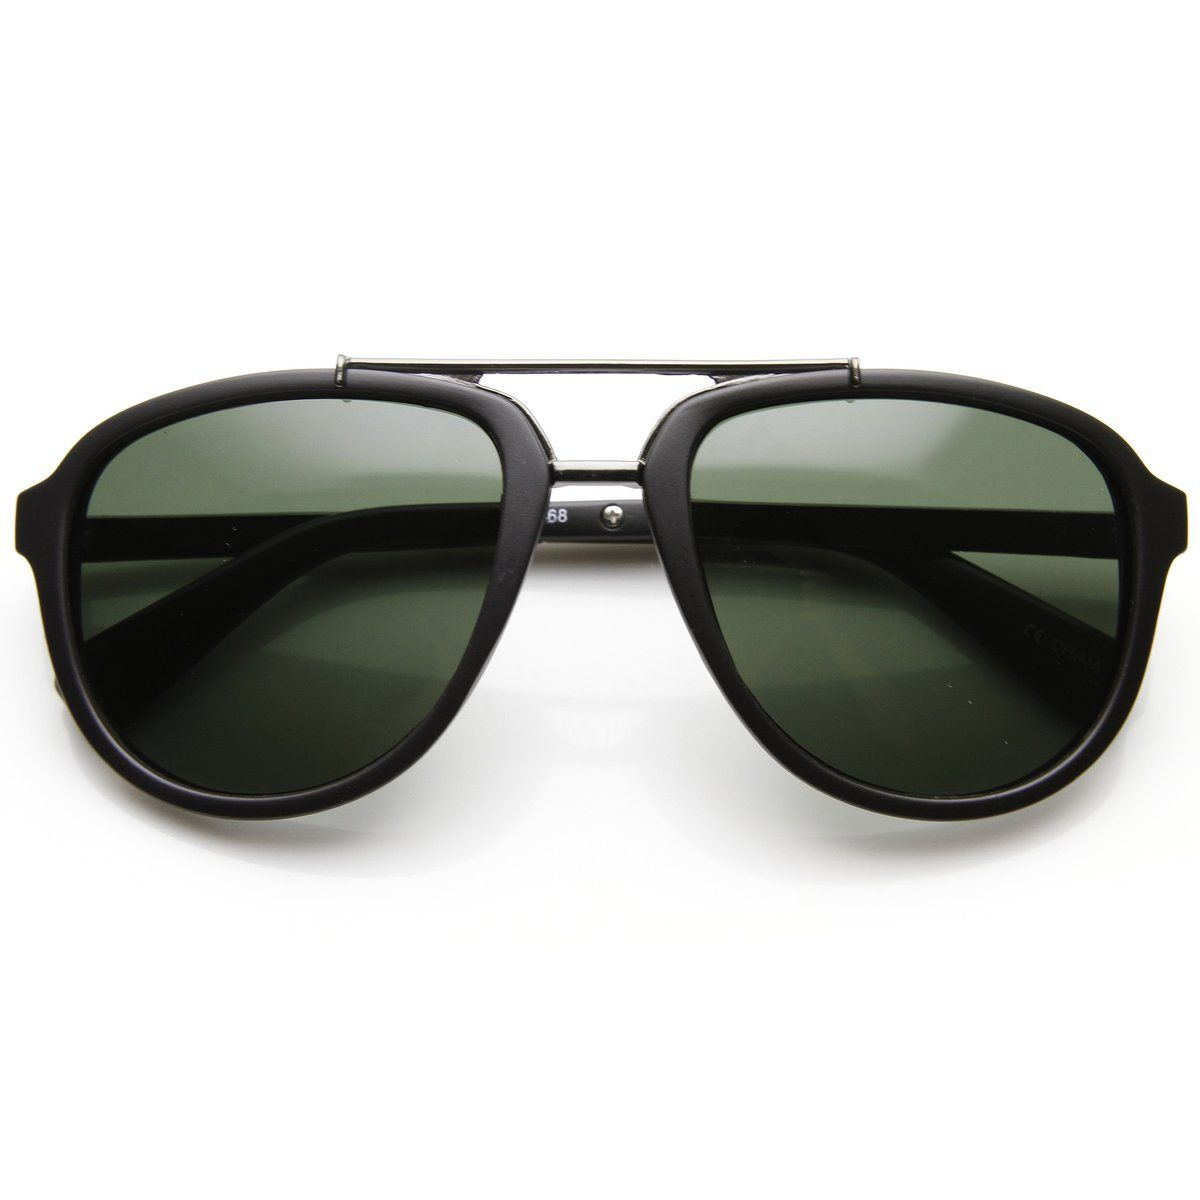 Retro Modern Dapper Mens European Roadster Square Aviator Sunglasses ...